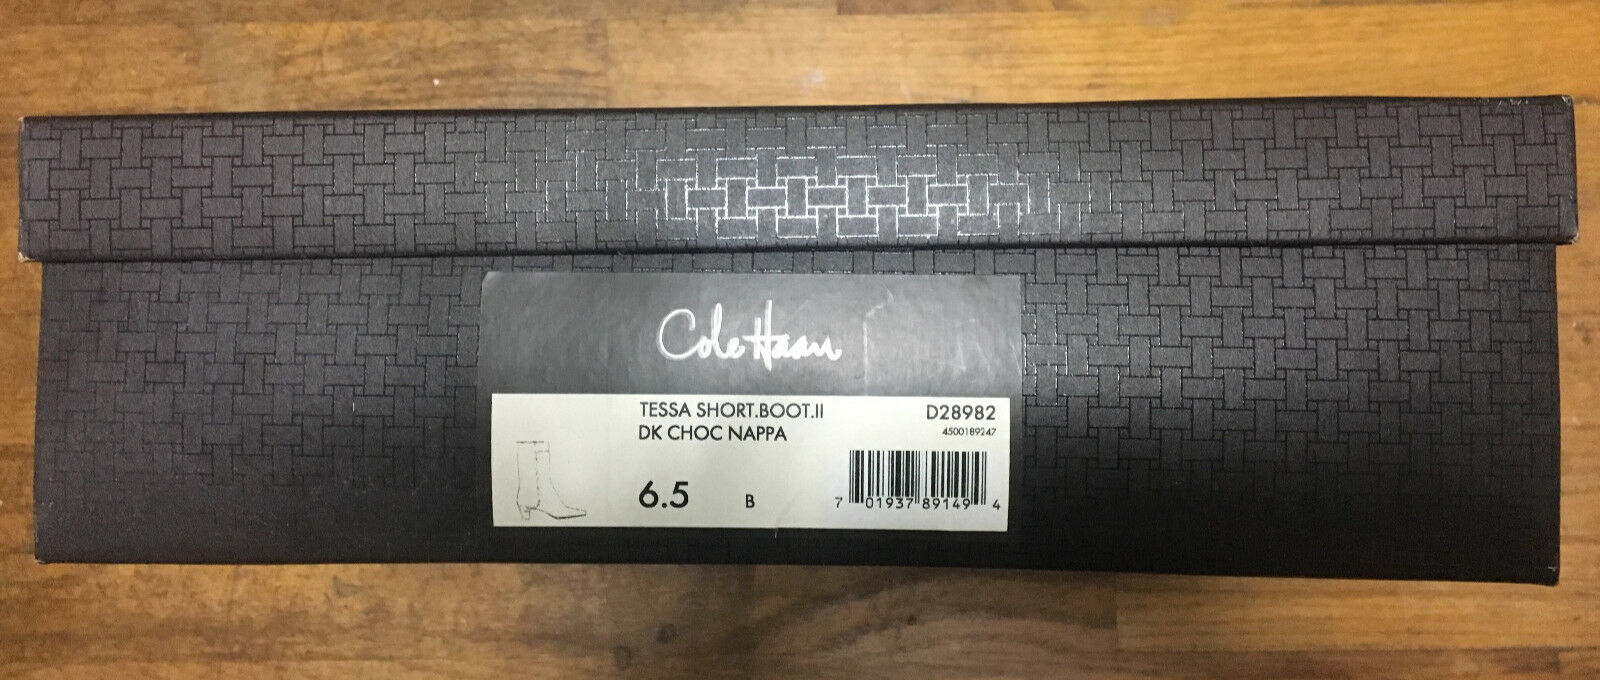 COLE HAAN Tessa Short Boot II Soft Soft Soft Nappa Leather Dk Chocolate 6.5 B  NEW IN BOX 03e145